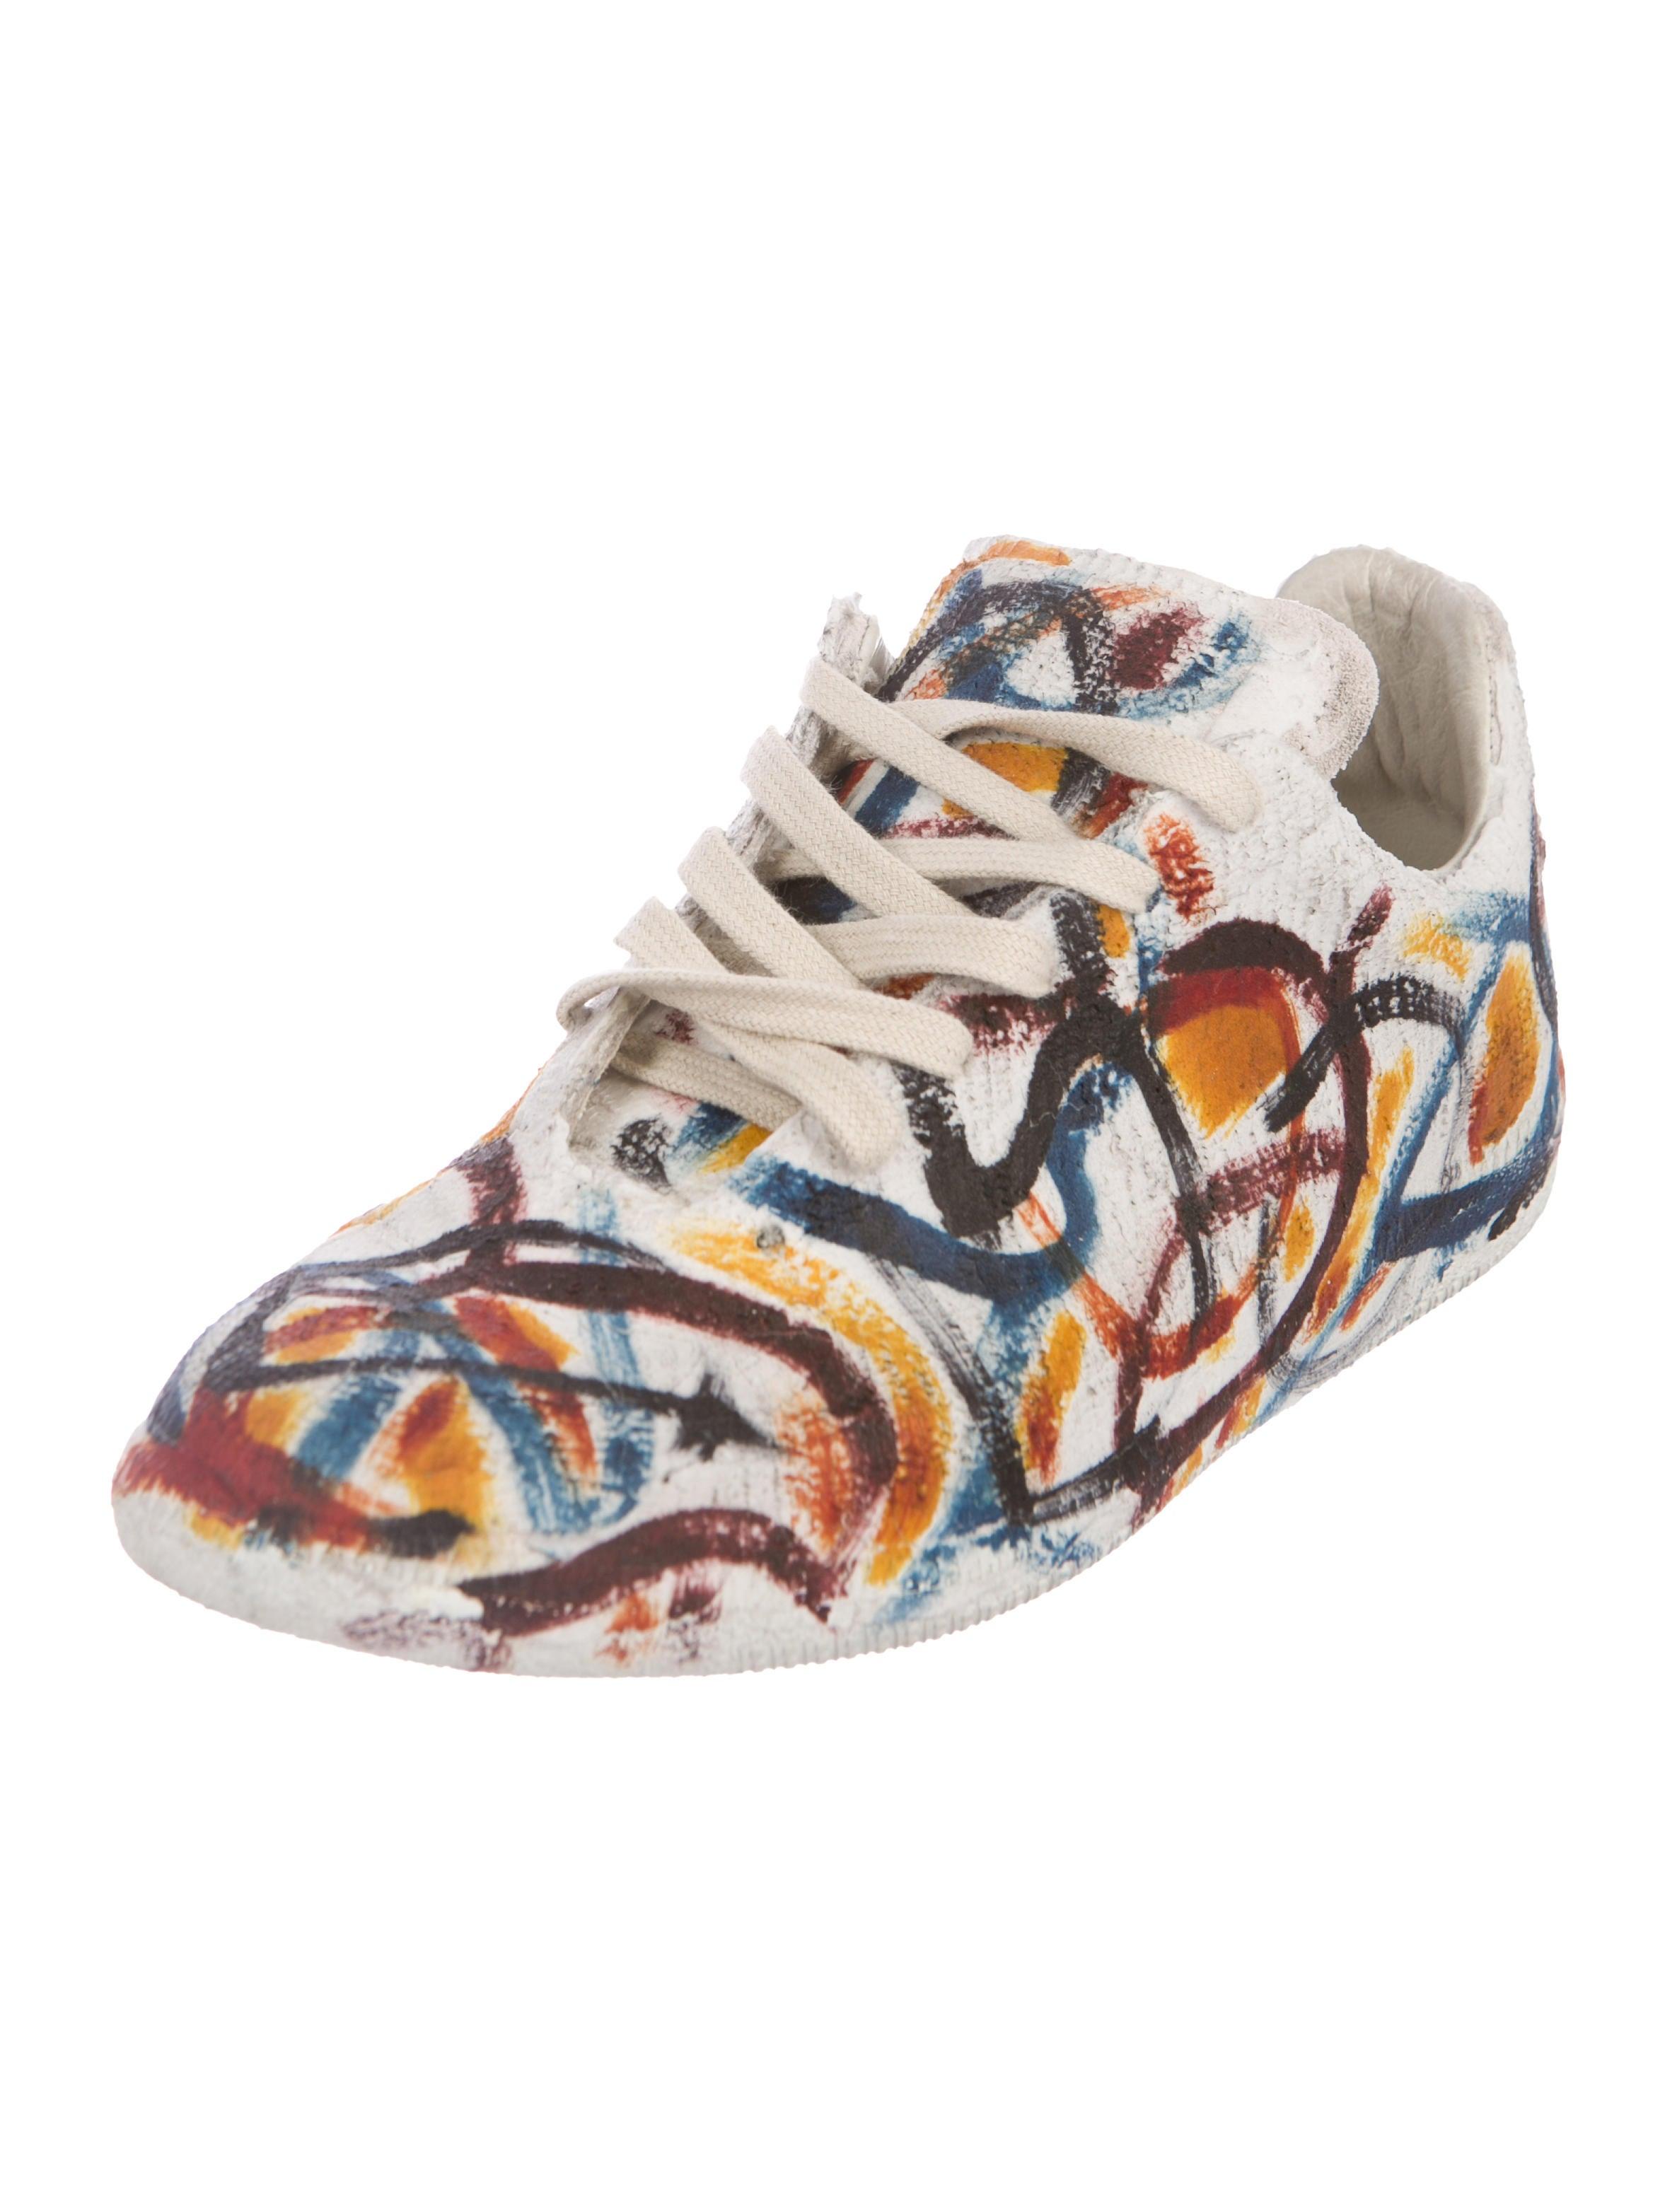 Maison Margiela 2016 Graffiti Replica Sneakers Shoes MAI